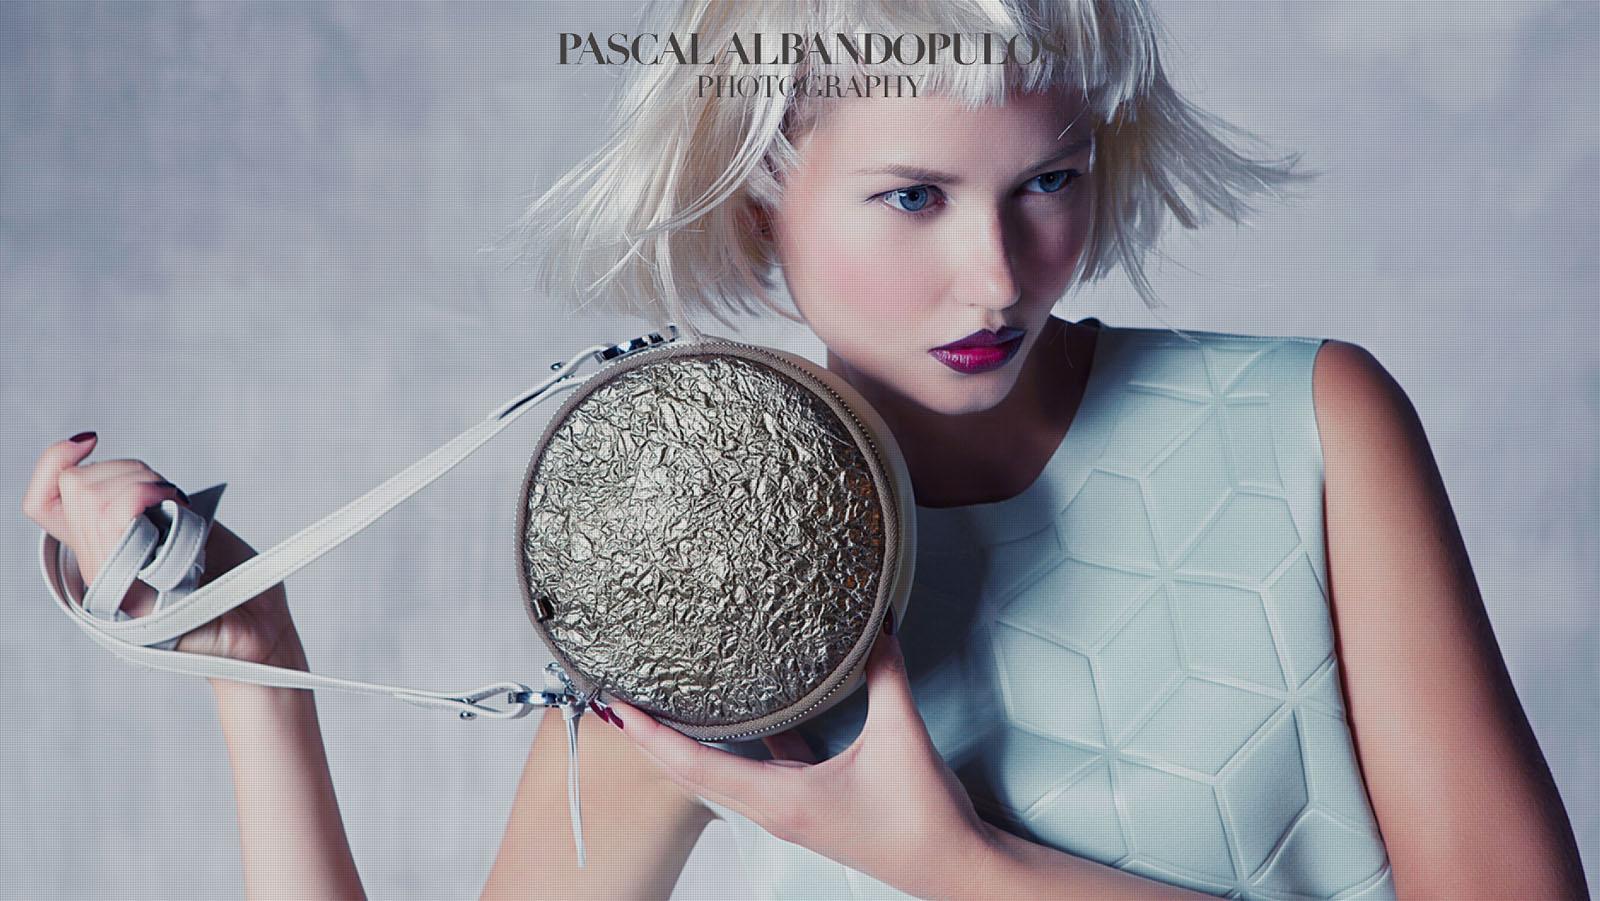 Pascal-Albandopulos